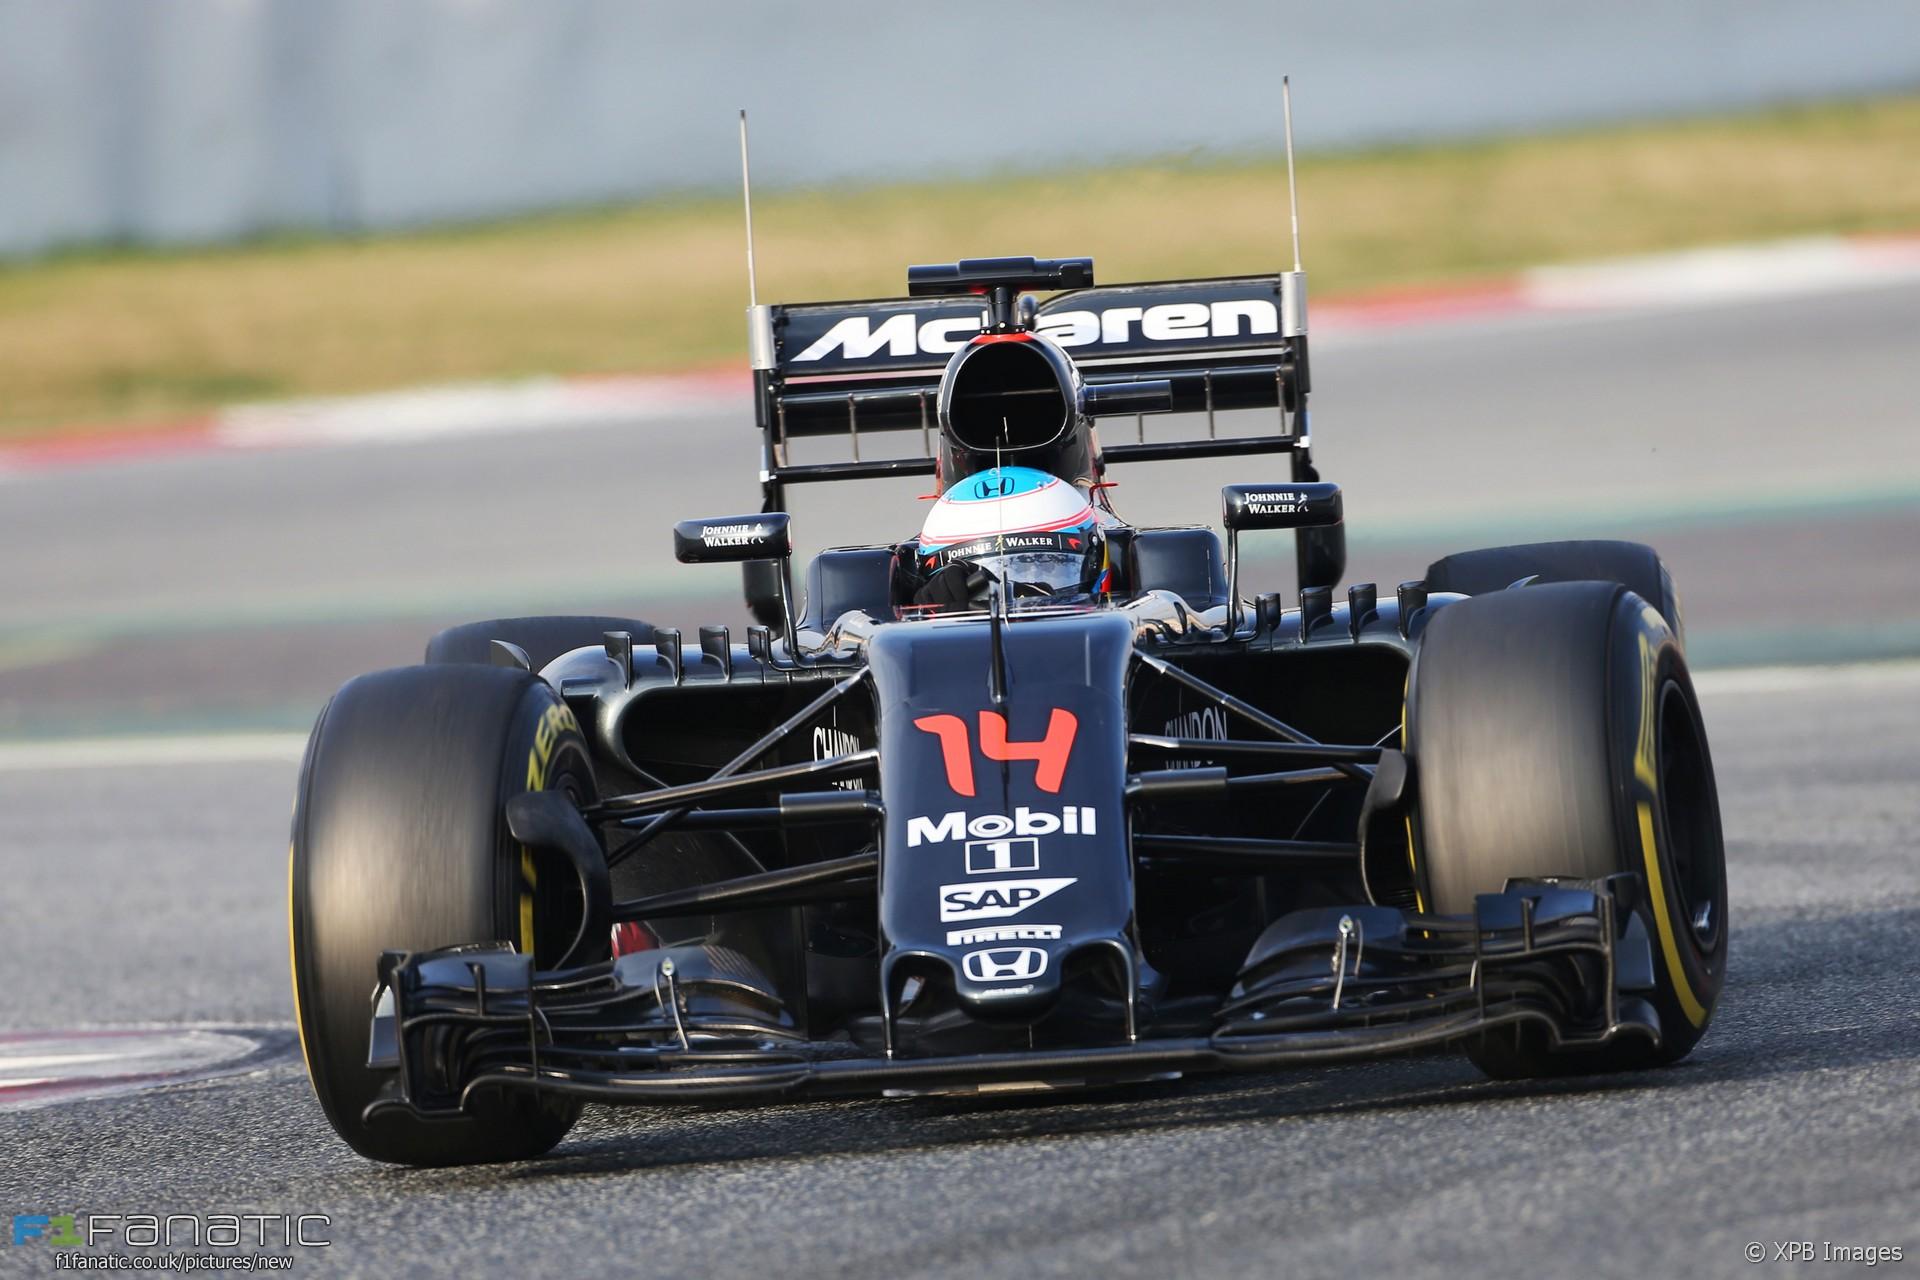 Fernando Alonso, McLaren, Circuit de Catalunya, 2016 · F1 ...